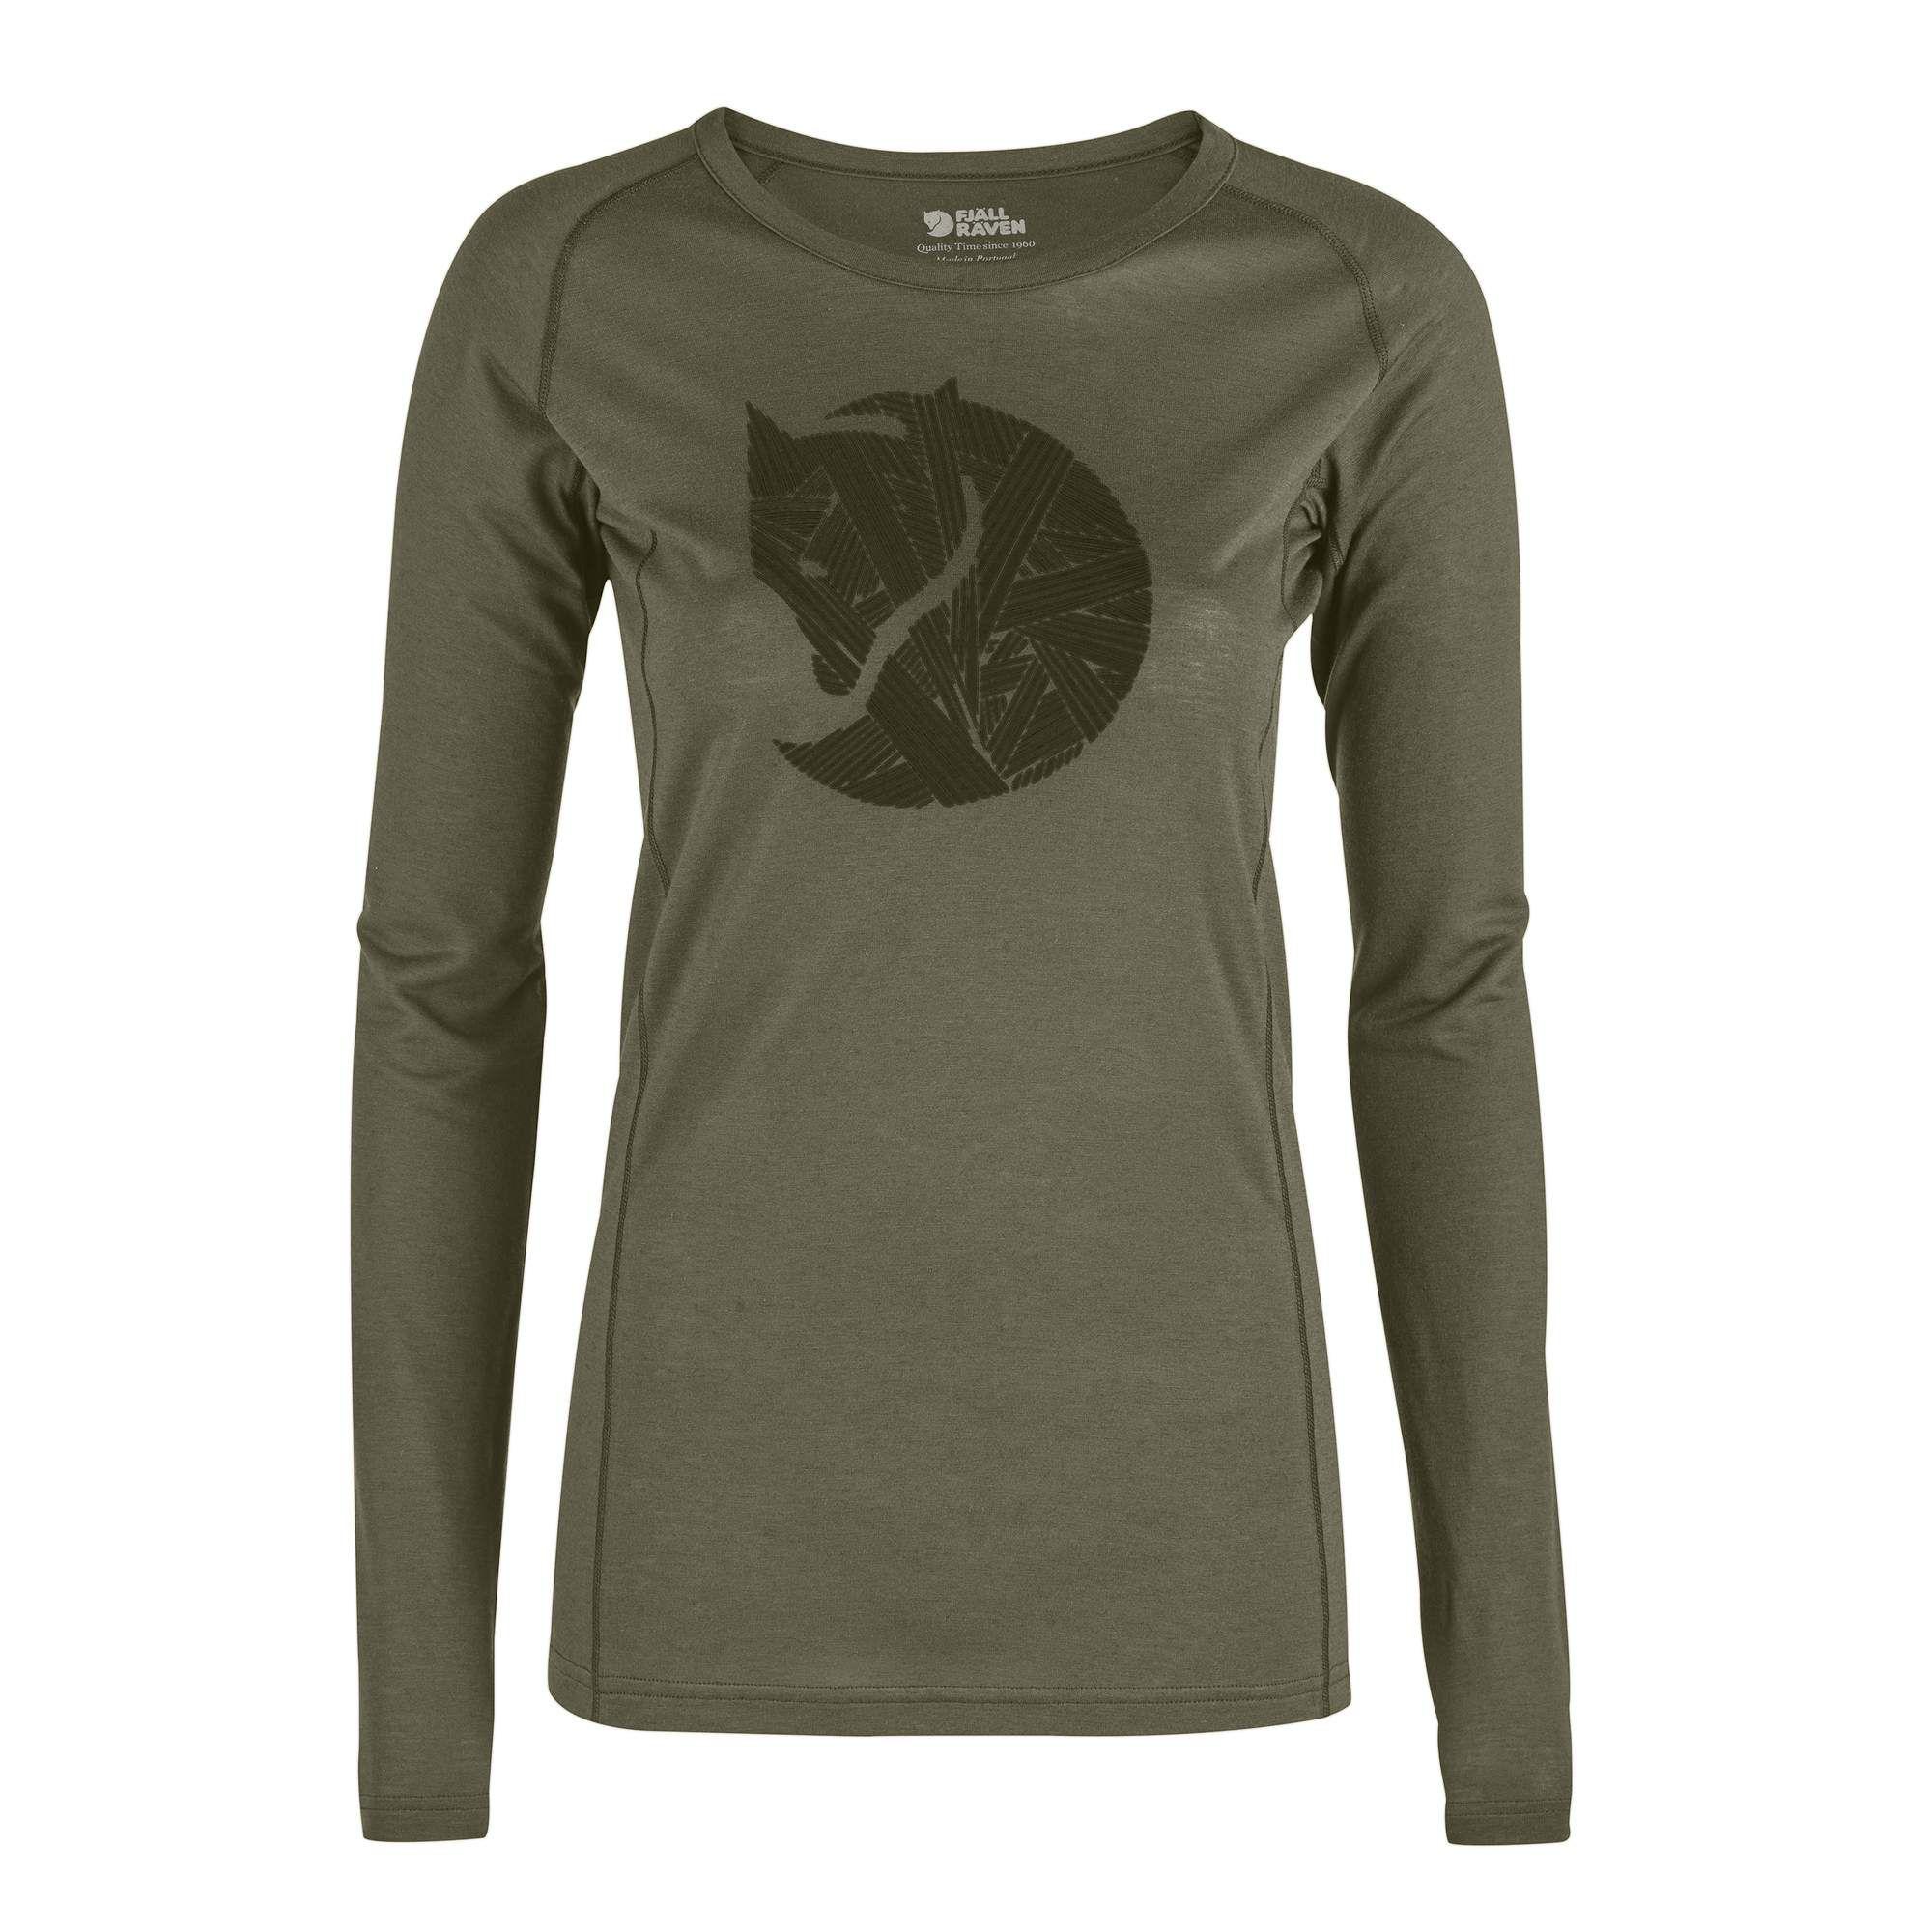 FJ/ÄLLR/ÄVEN Damen Abisko Hike Longsleeve Shirt